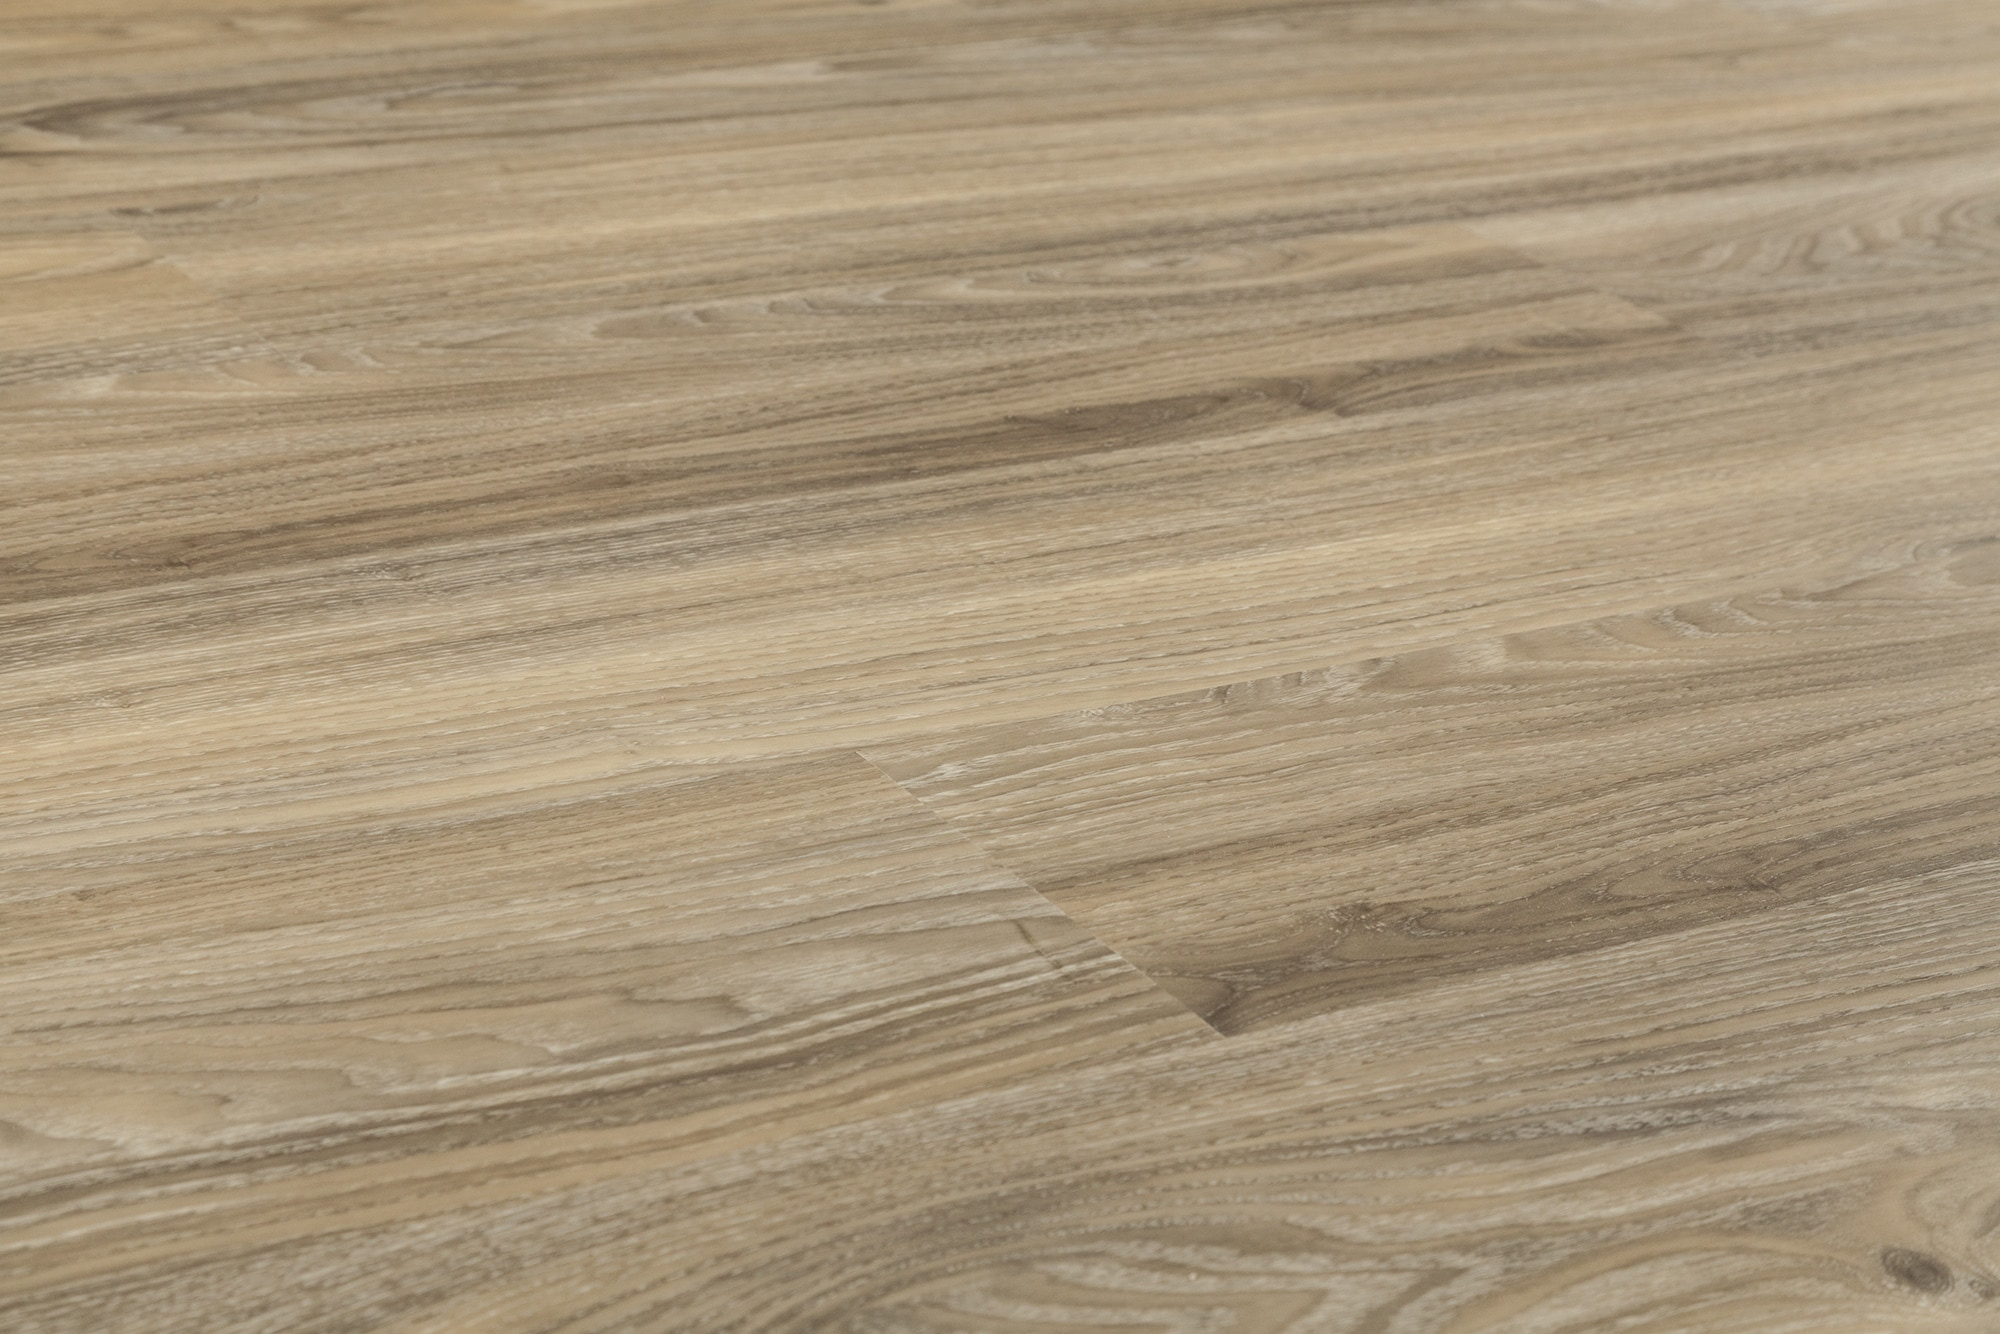 FREE Samples: Vesdura Vinyl Planks   4.2mm PVC Click Lock   Handscraped  Collection Chestnut